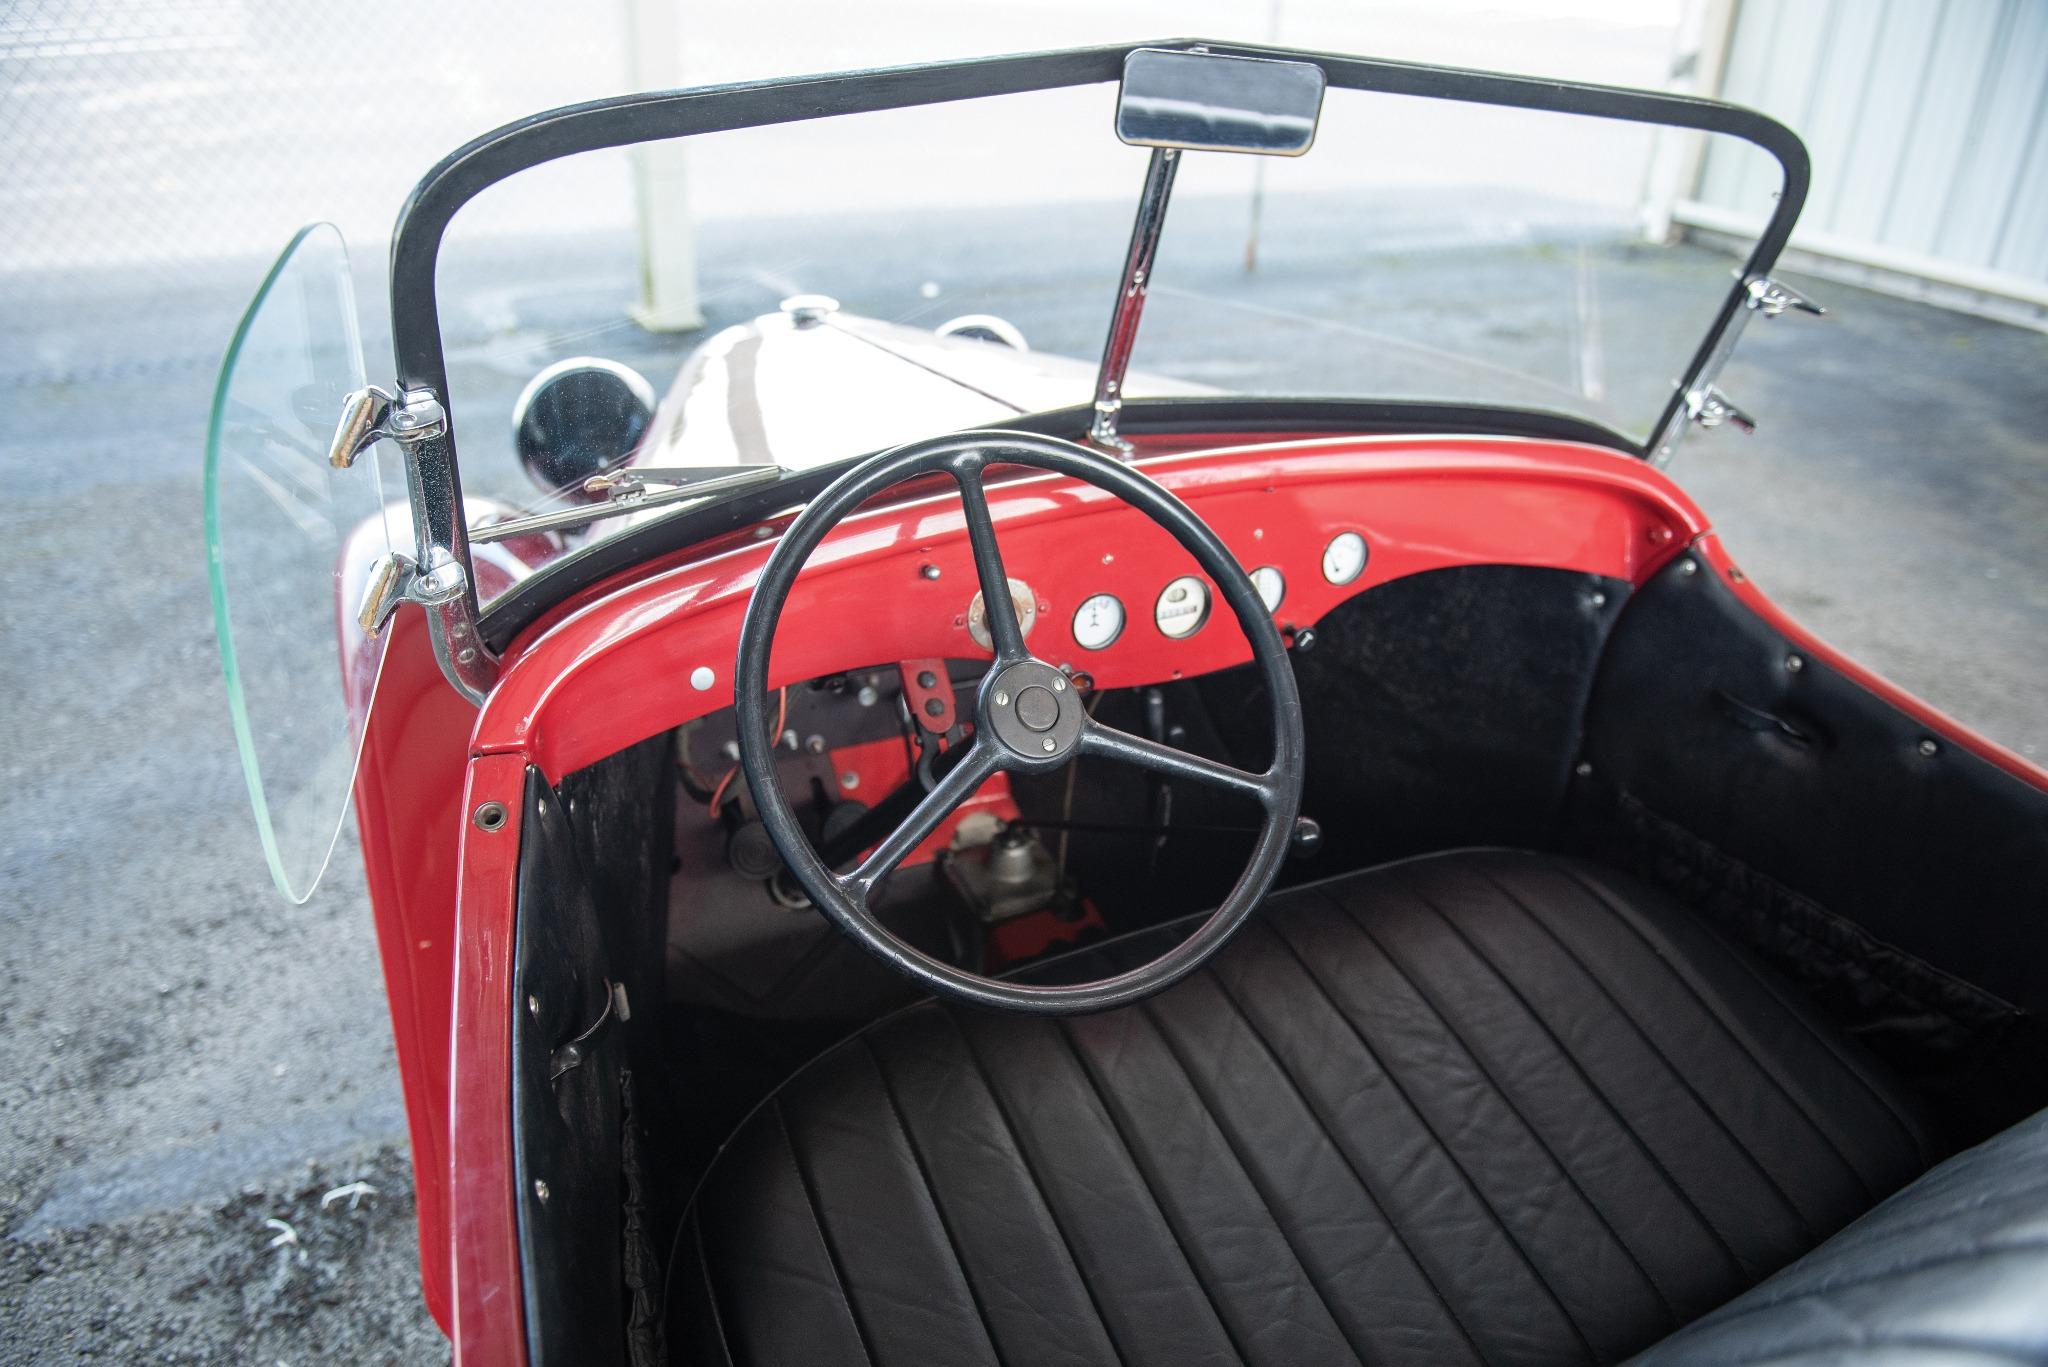 1937 American Austin interior